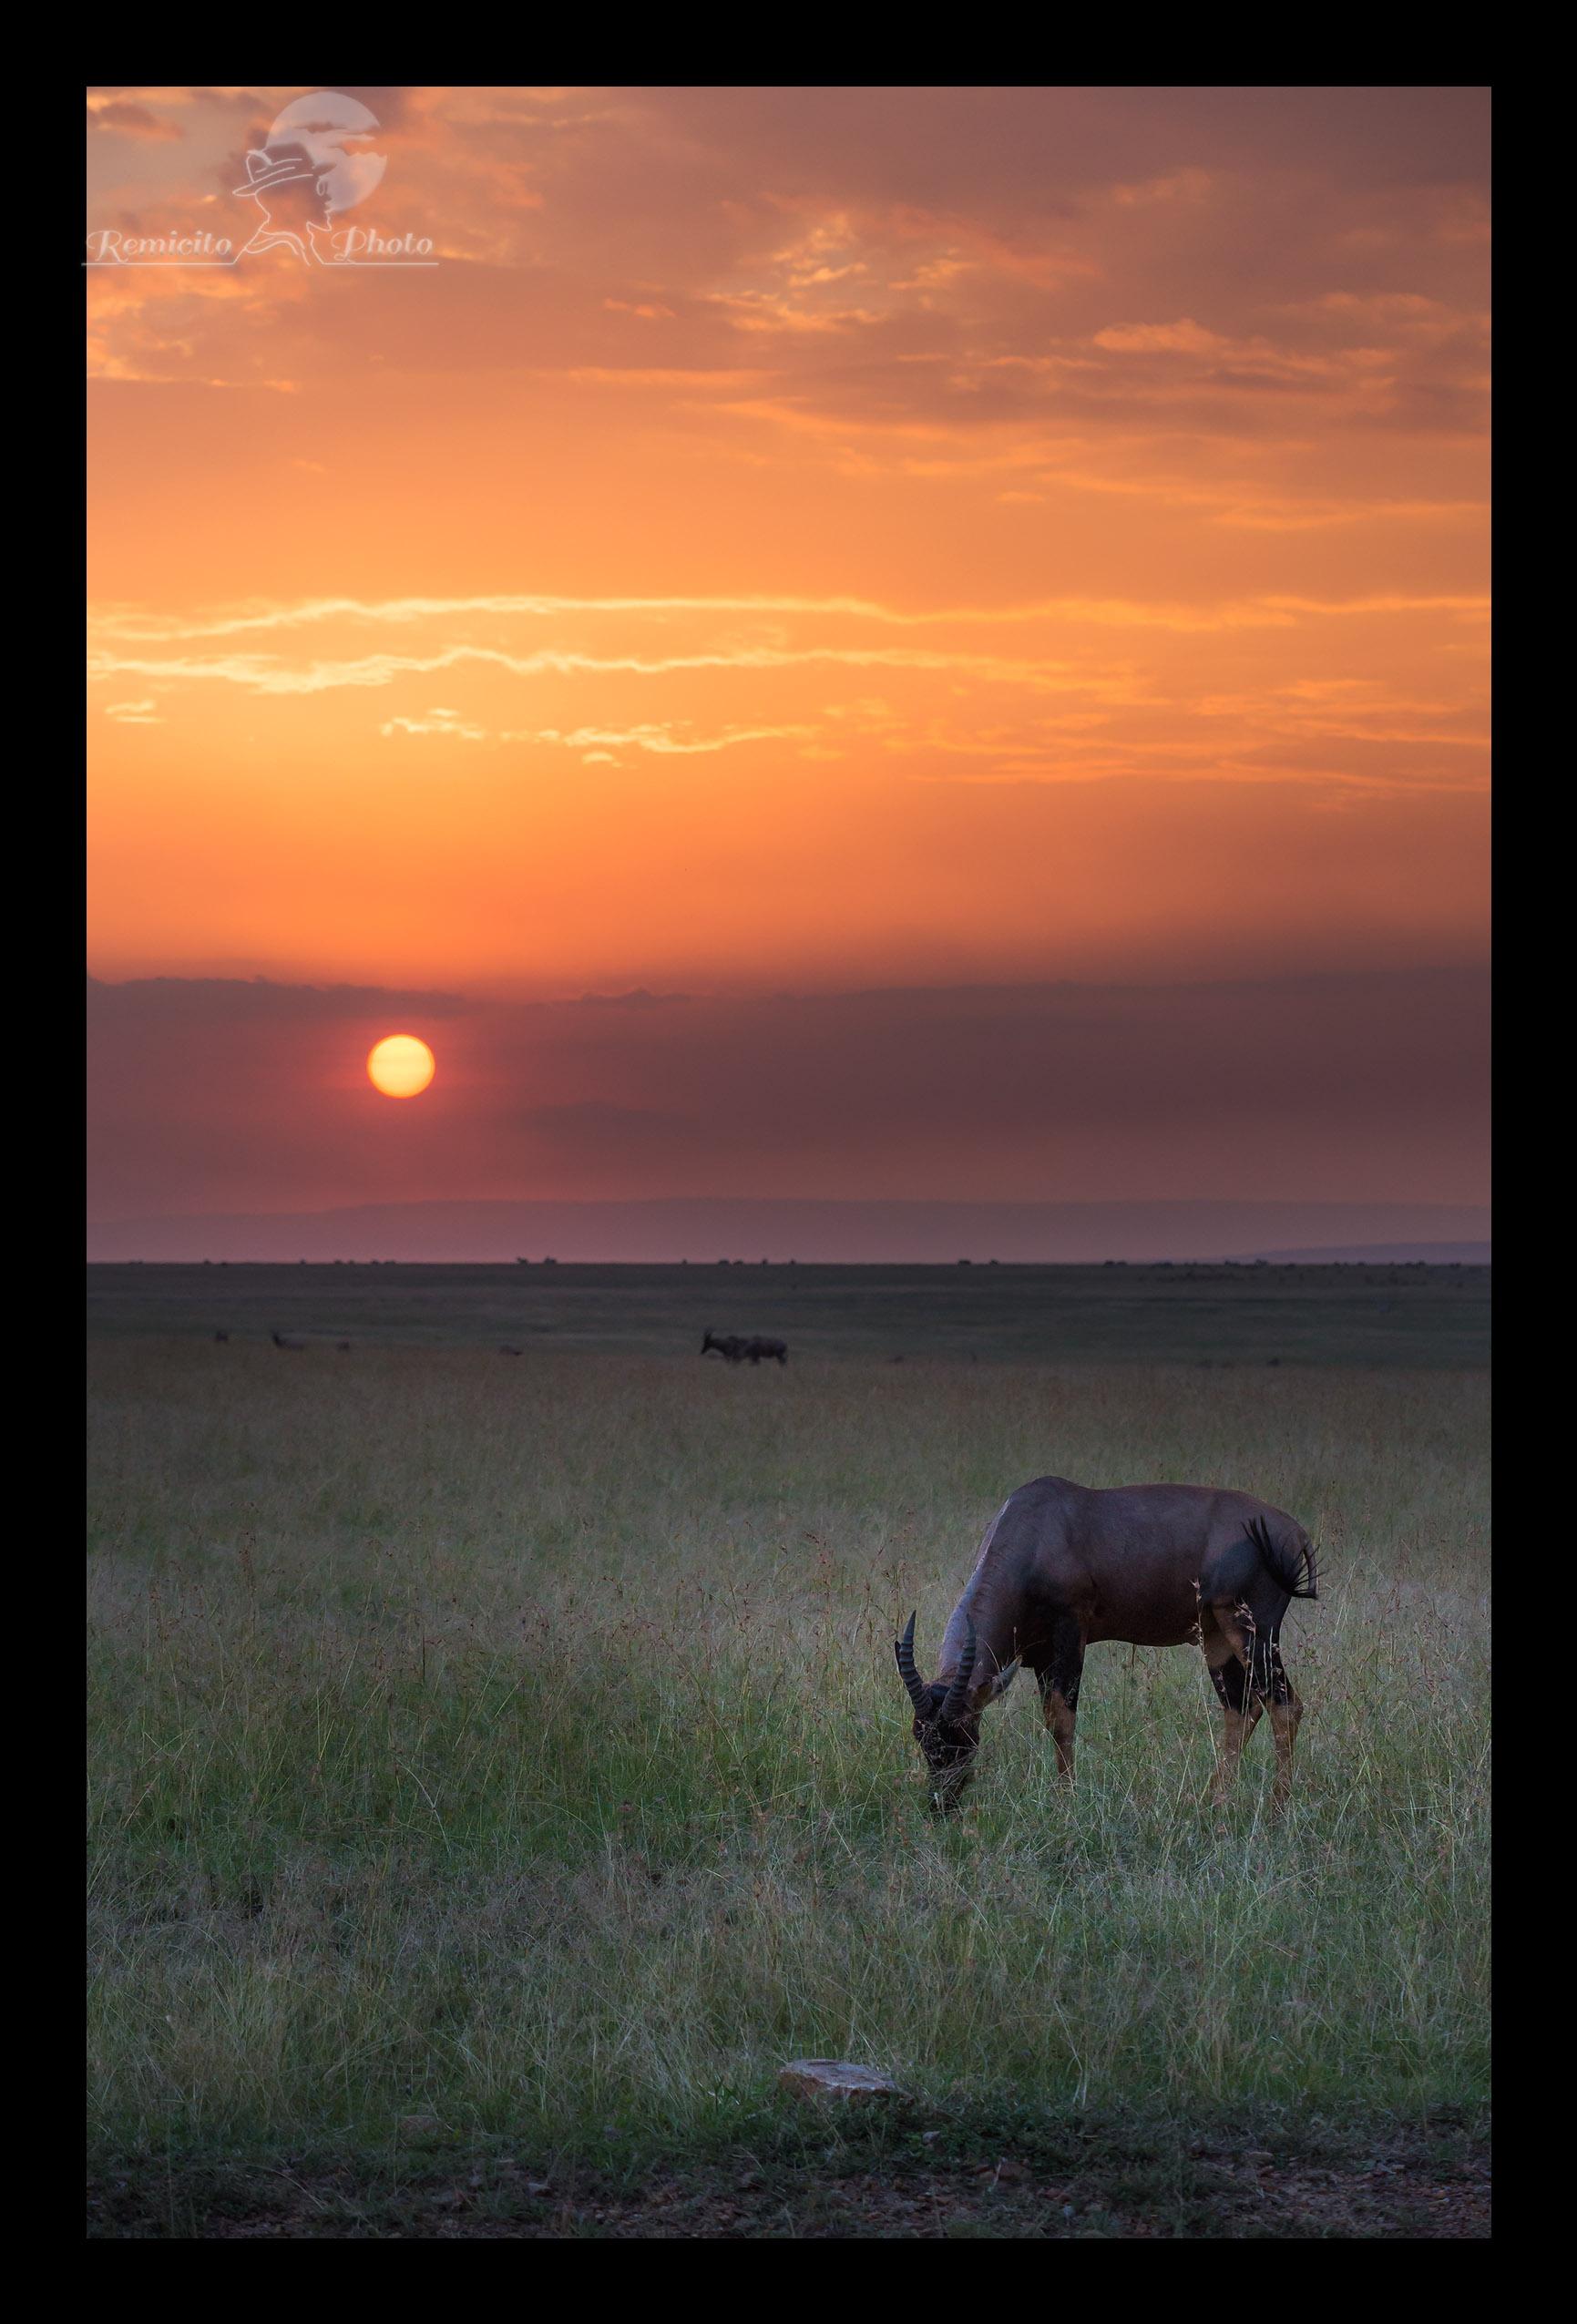 remicito photo, photo savane, photo afrique, photo safari afrique, photo safari kenya, photo safari tanzanie, photo afrique couleur, photo couleur kenya, photo couleur tanzanie, photo couleur Masai mara, photo serengeti, photo voyage afrique, photo voyage kenya, photo voyage tanzanie, photo savane afrique, photo savane kenya, Photo savane tanzanie, belle photo afrique, acheter photo afrique, tirage photo afrique, acheter photo kenya, acheter photo tanzanie, tirage photo safari, jolie photo savane, offrir photo afrique, acheter photo coucher de soleil, photo coucher de soleil Afrique,  Sunset Africa, color africa, color africa photo, kenya photograph, kenya savanna photo, tanzania photograph, kenya savanna photographs, tanzania savanna Photo, best africa shot, best africa photo, best Sunset shot, best Sunset photo, best Sunset photograph, buy photo africa, africa gift photo, Sunset gift photo, buy Sunset photo, buy africa Sunset photo,  Foto puesta del sol, foto africa regalo, comprar foto africa, offrecer foto africa, africa maravilla, africa linda, foto color, foto kenya, foto tanzania, leon africa, puesta del sol sabana, puesta del sol Kenya, puesta del sol Tanzania,  photo couleur paysage, color photo, color photography, photo décoration mur, photo décoration chambre, photo décoration toilettes, cadeau décoration, idée cadeau décoration, idée cadeau pour lui, idée cadeau pour elle, idée cadeau photo mariage, idée cadeau photo nouvel appart, idée cadeau photo nouvel appartement, idée cadeau photo nouvelle maison, idée cadeau photo décoration, idée cadeau originale, idée cadeau fête des pères, idée cadeau fête des mères, idée cadeau naissance, idée cadeau anniversaire, idée cadeau anniversaire homme, idée cadeau anniversaire femme, idée cadeau noël, idée cadeau noel, idée cadeau grand-mère, idée cadeau grand-père, idée cadeau grands-parents, idée cadeau parents, idée cadeau enfants, idée cadeau adulte,  jolie photo,  offrir photo, offrir belle photo, offrir photo c